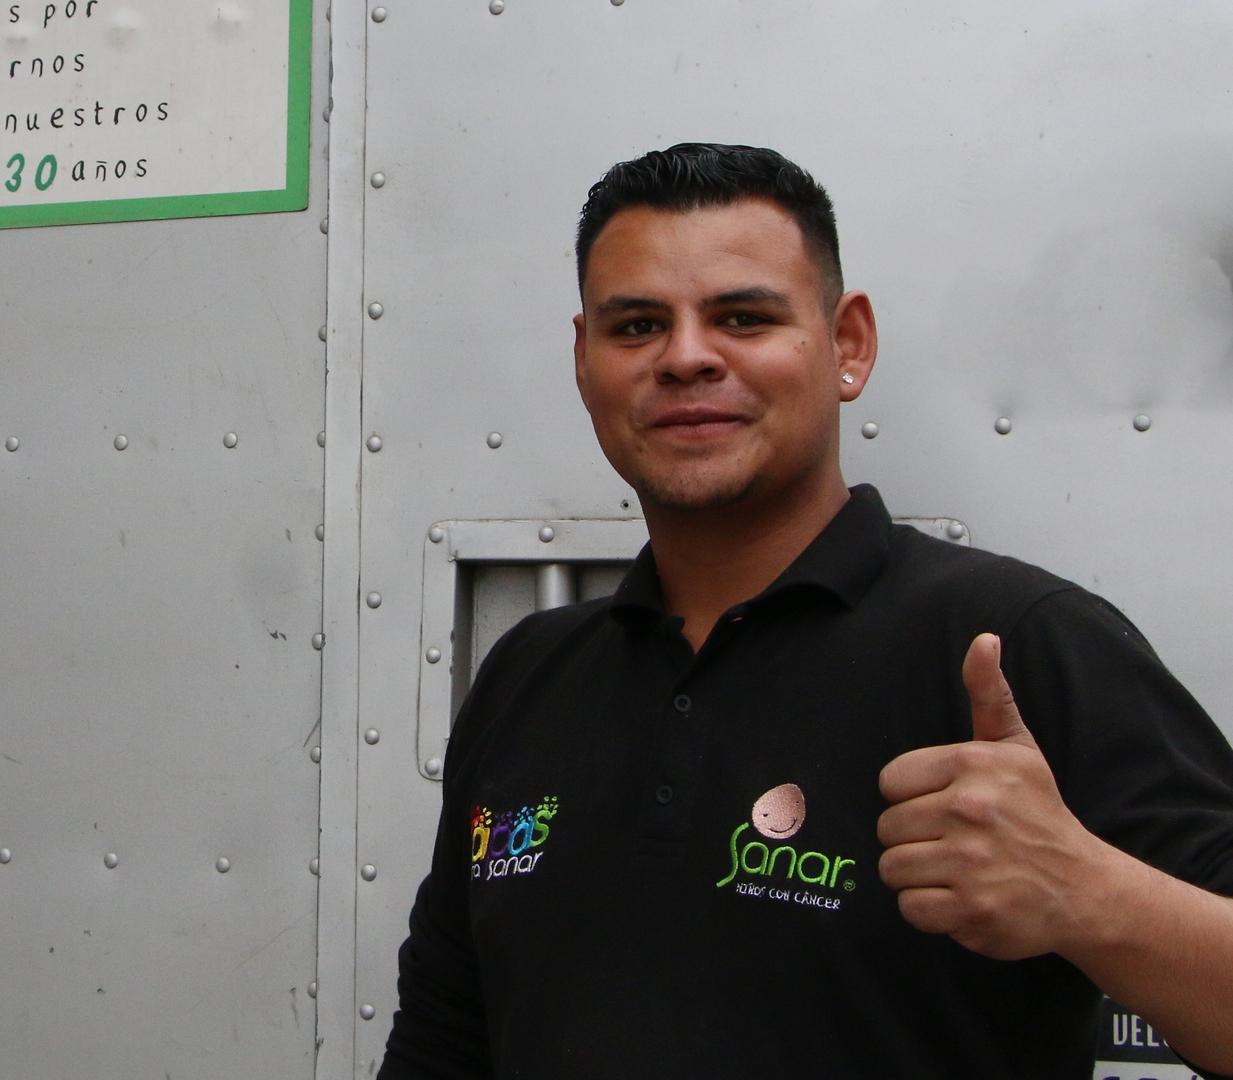 Carlos Bejarano - C.C: 1014.242.077